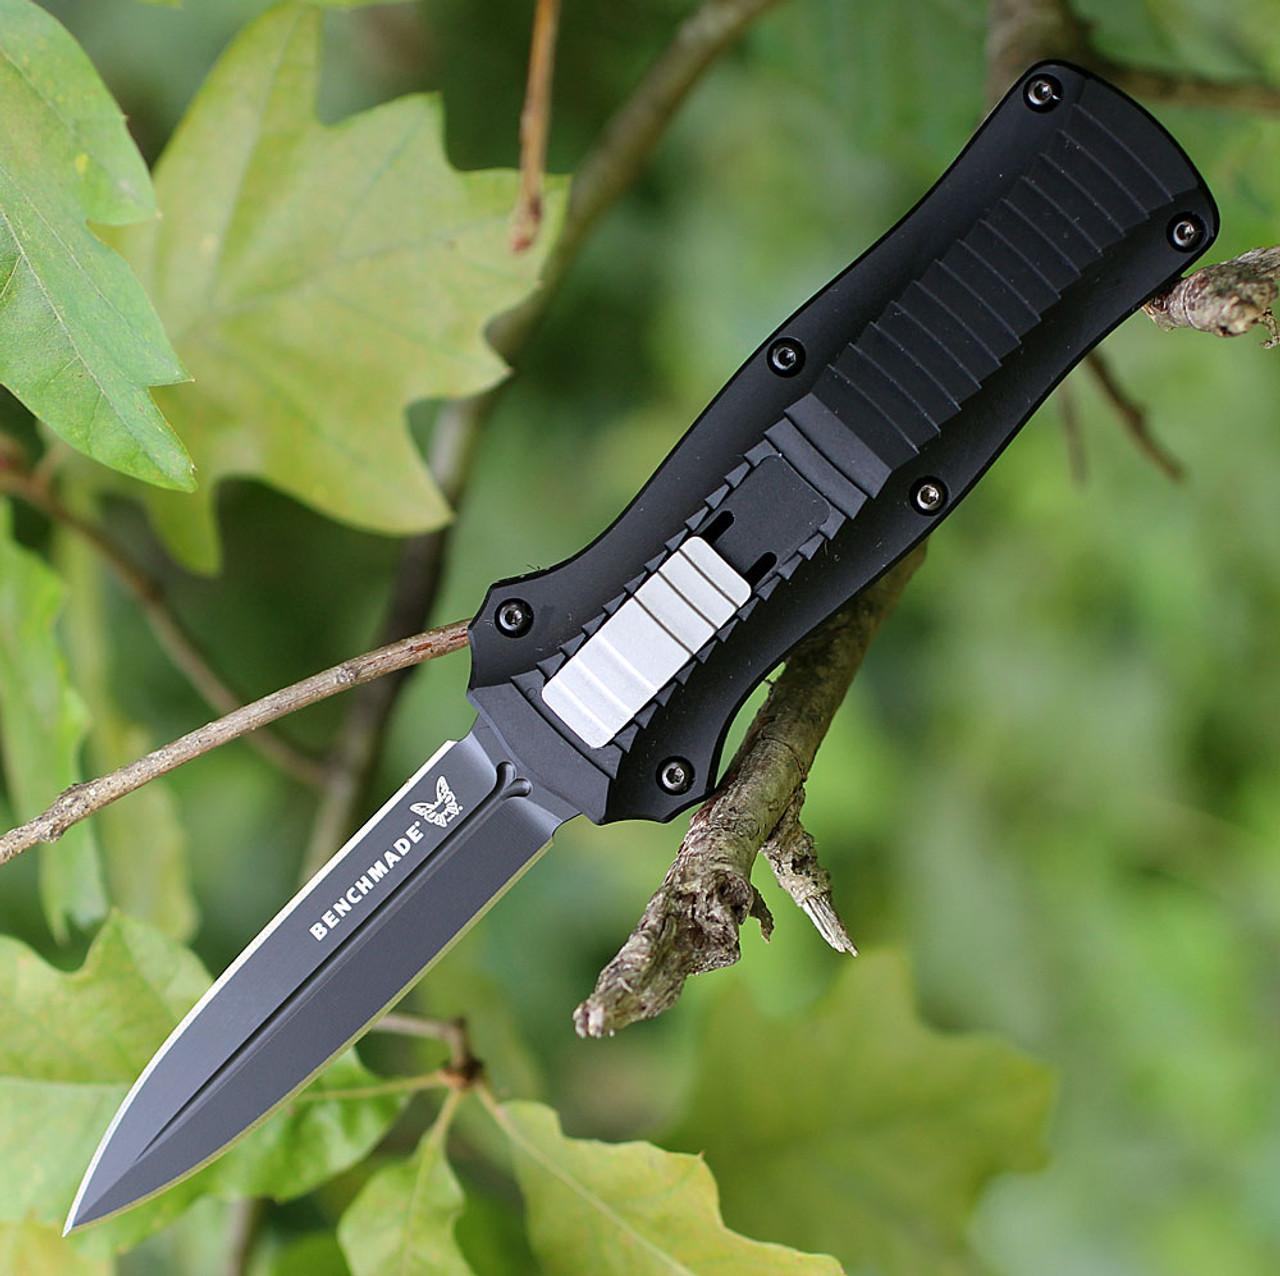 Benchmade Auto Mini Infidel OTF, 3350BK, 3.10 in. D2 Stainless Double Edge Blade, Aluminum Handles, Black Plain Edge